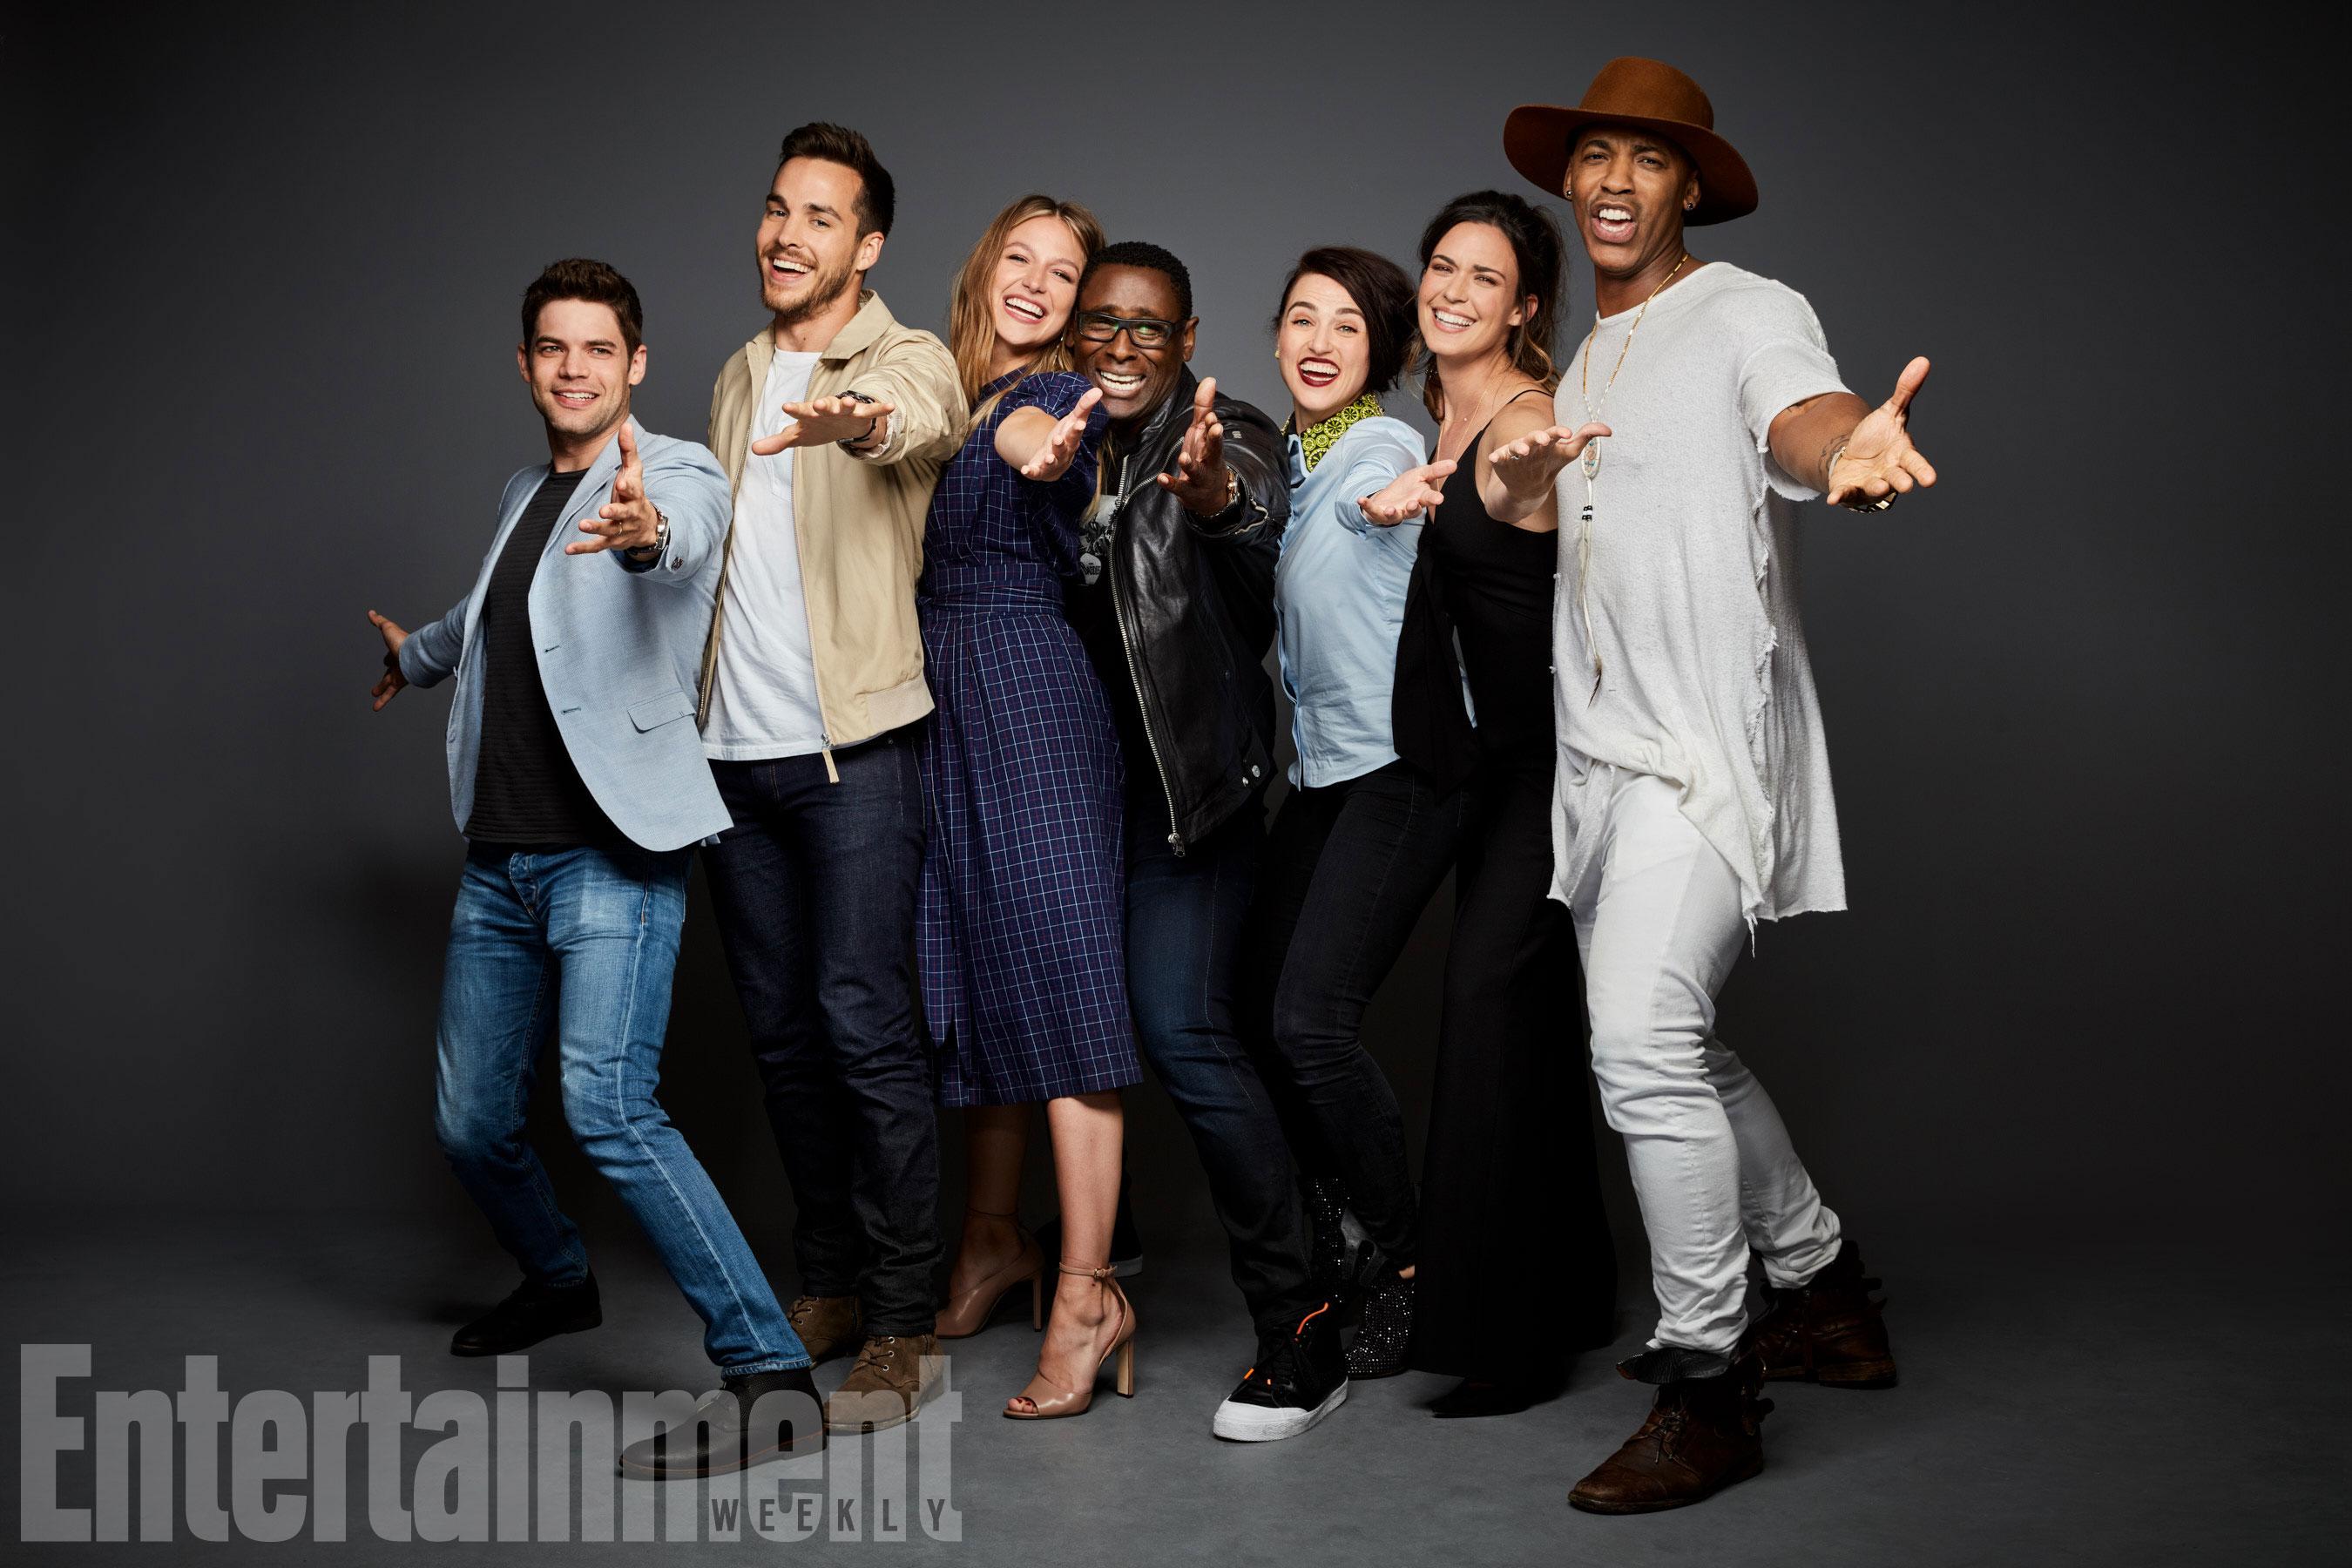 Jeremy Jordan, Chris Wood, Melissa Benoist, David Harewood, Katie McGrath, Odette Annable és Mehcad Brooks (Supergirl)